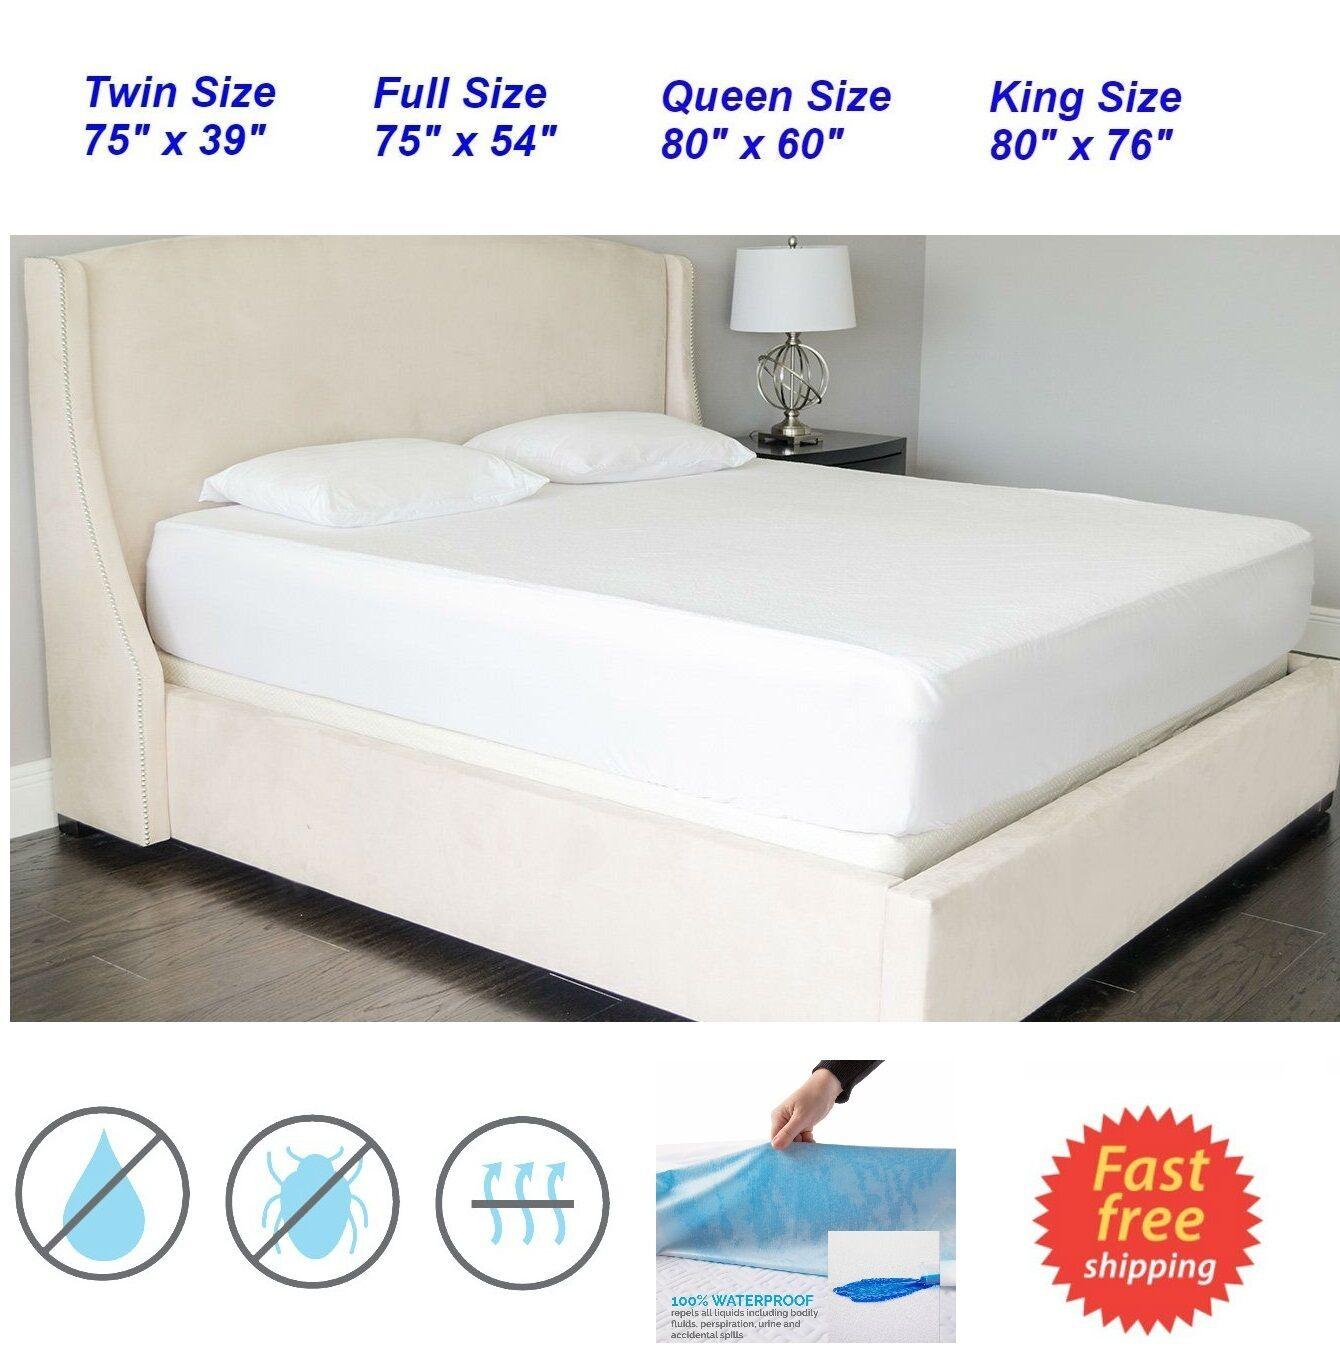 king mattress topper soft u0026 quiet waterproof mattress bed protector cover king queen full size topper